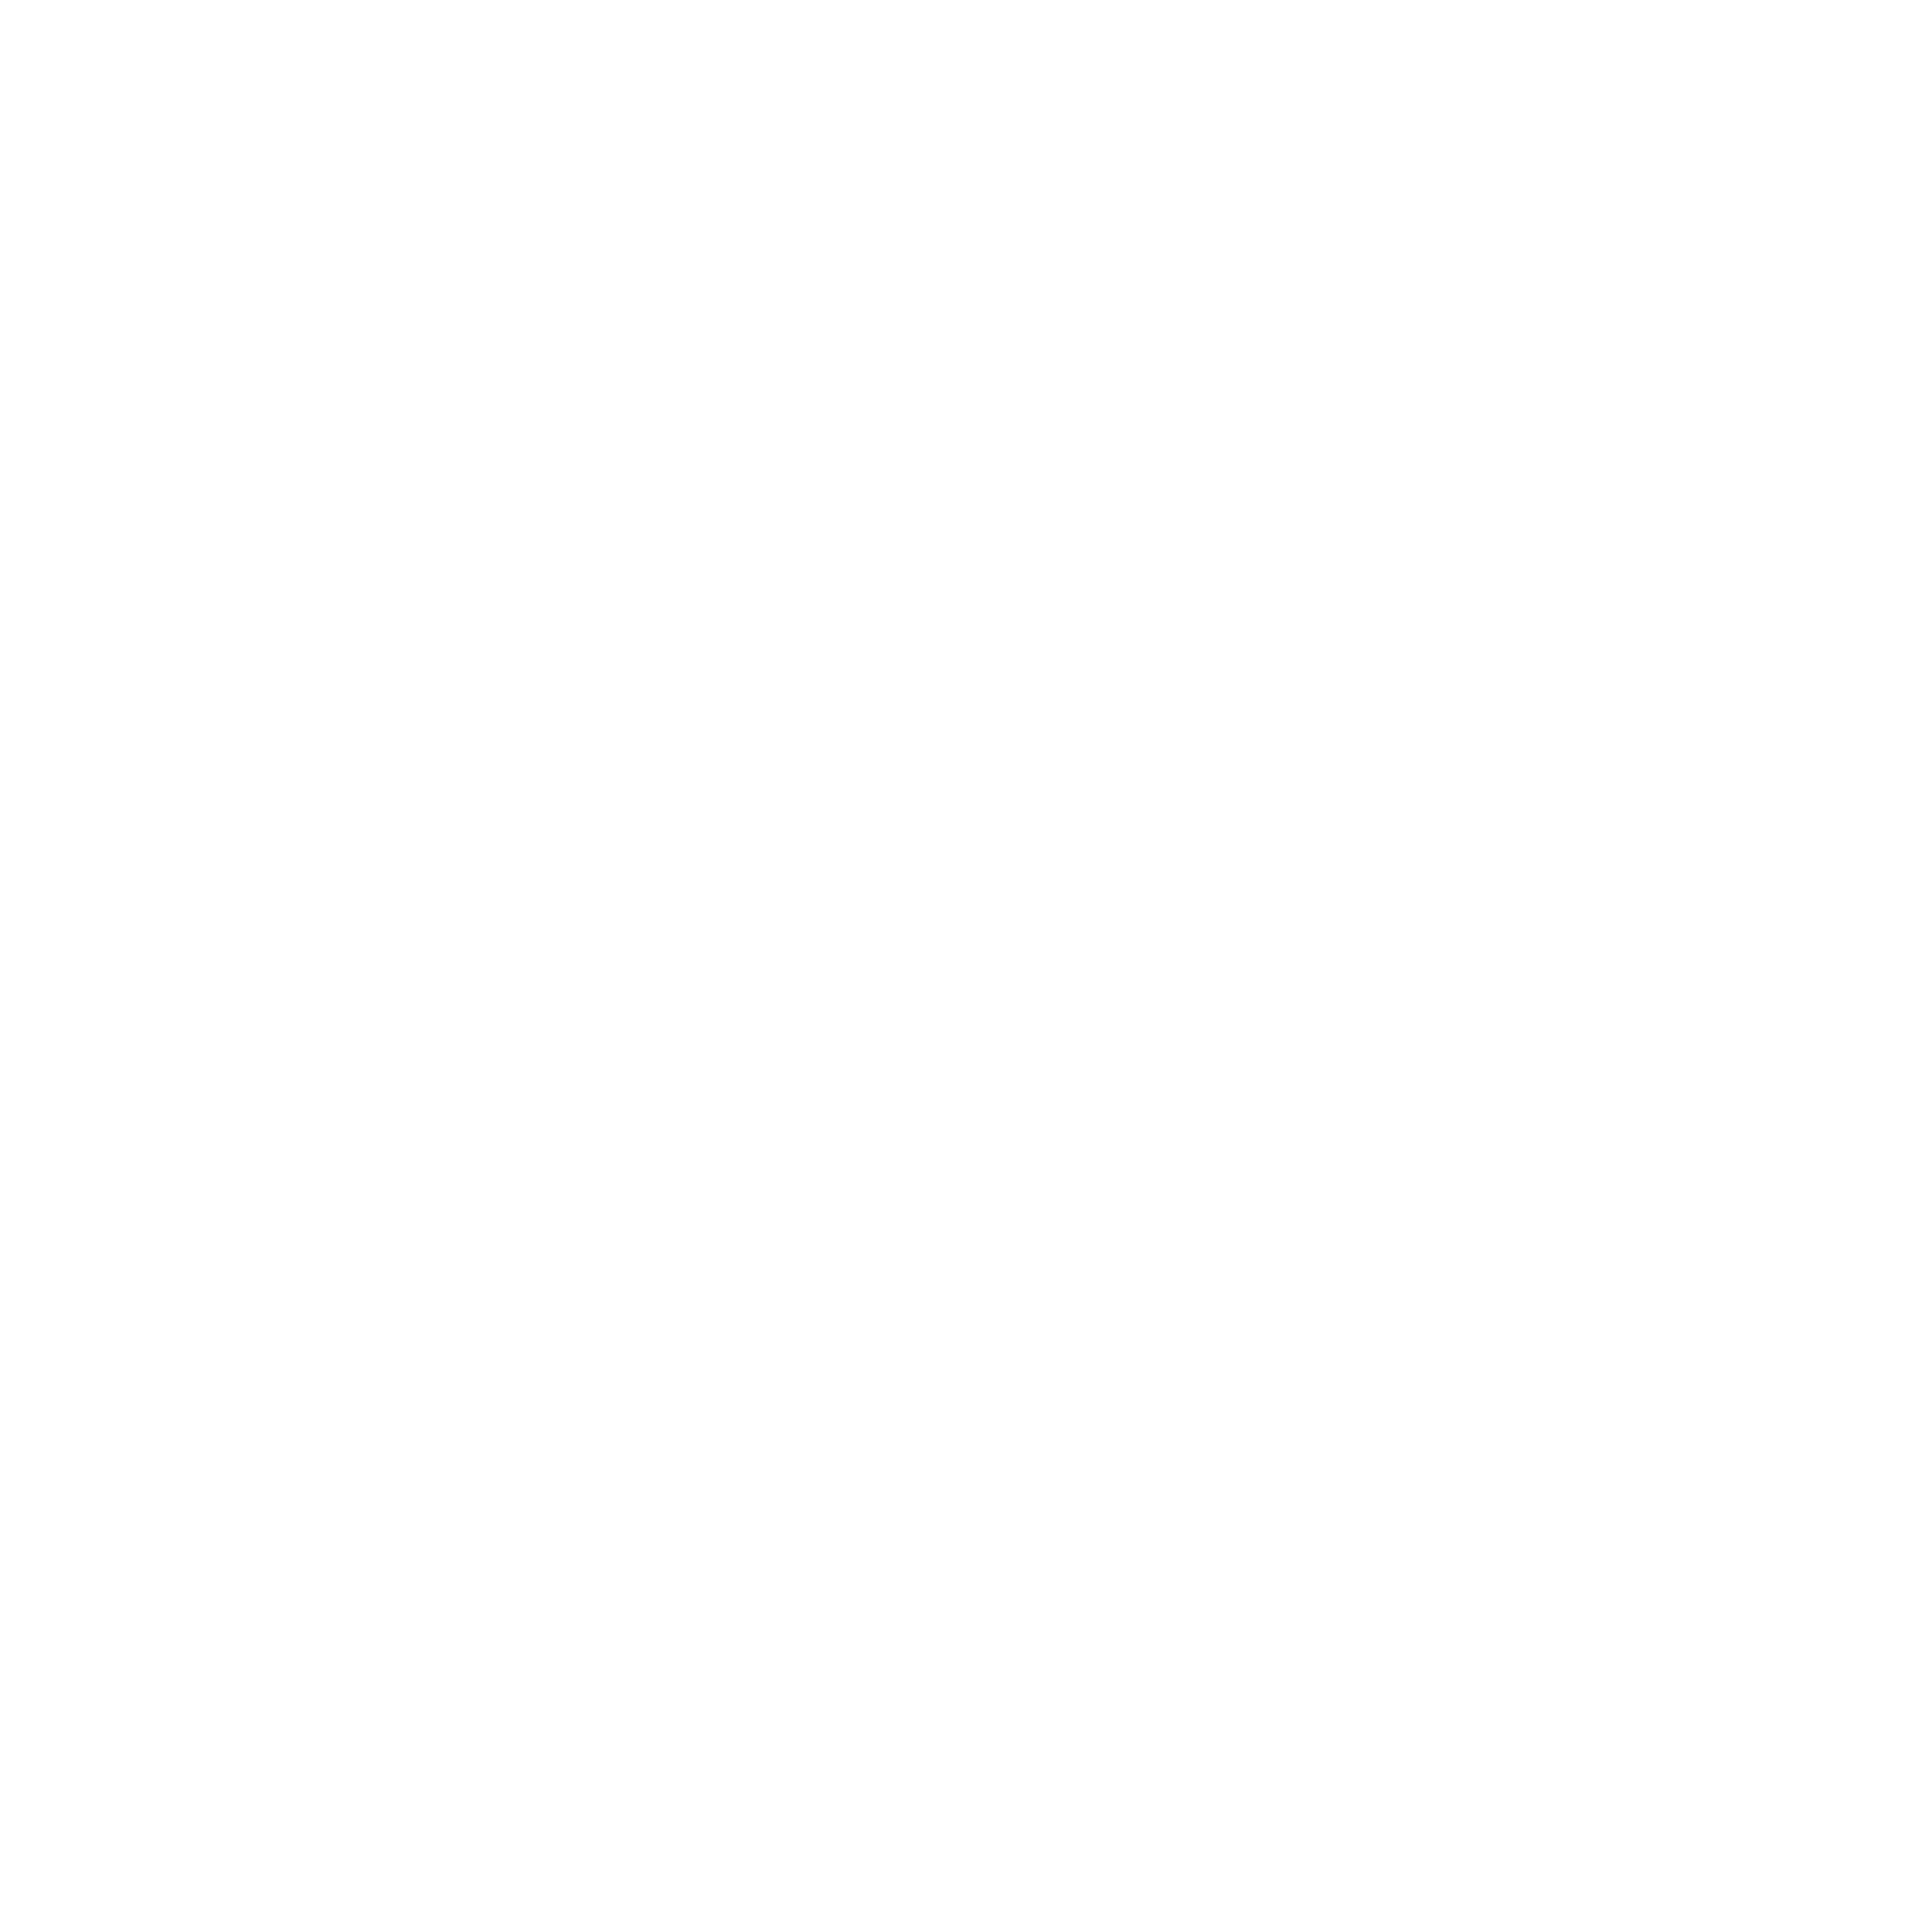 ADROMICFMS 4 – SUDADERA